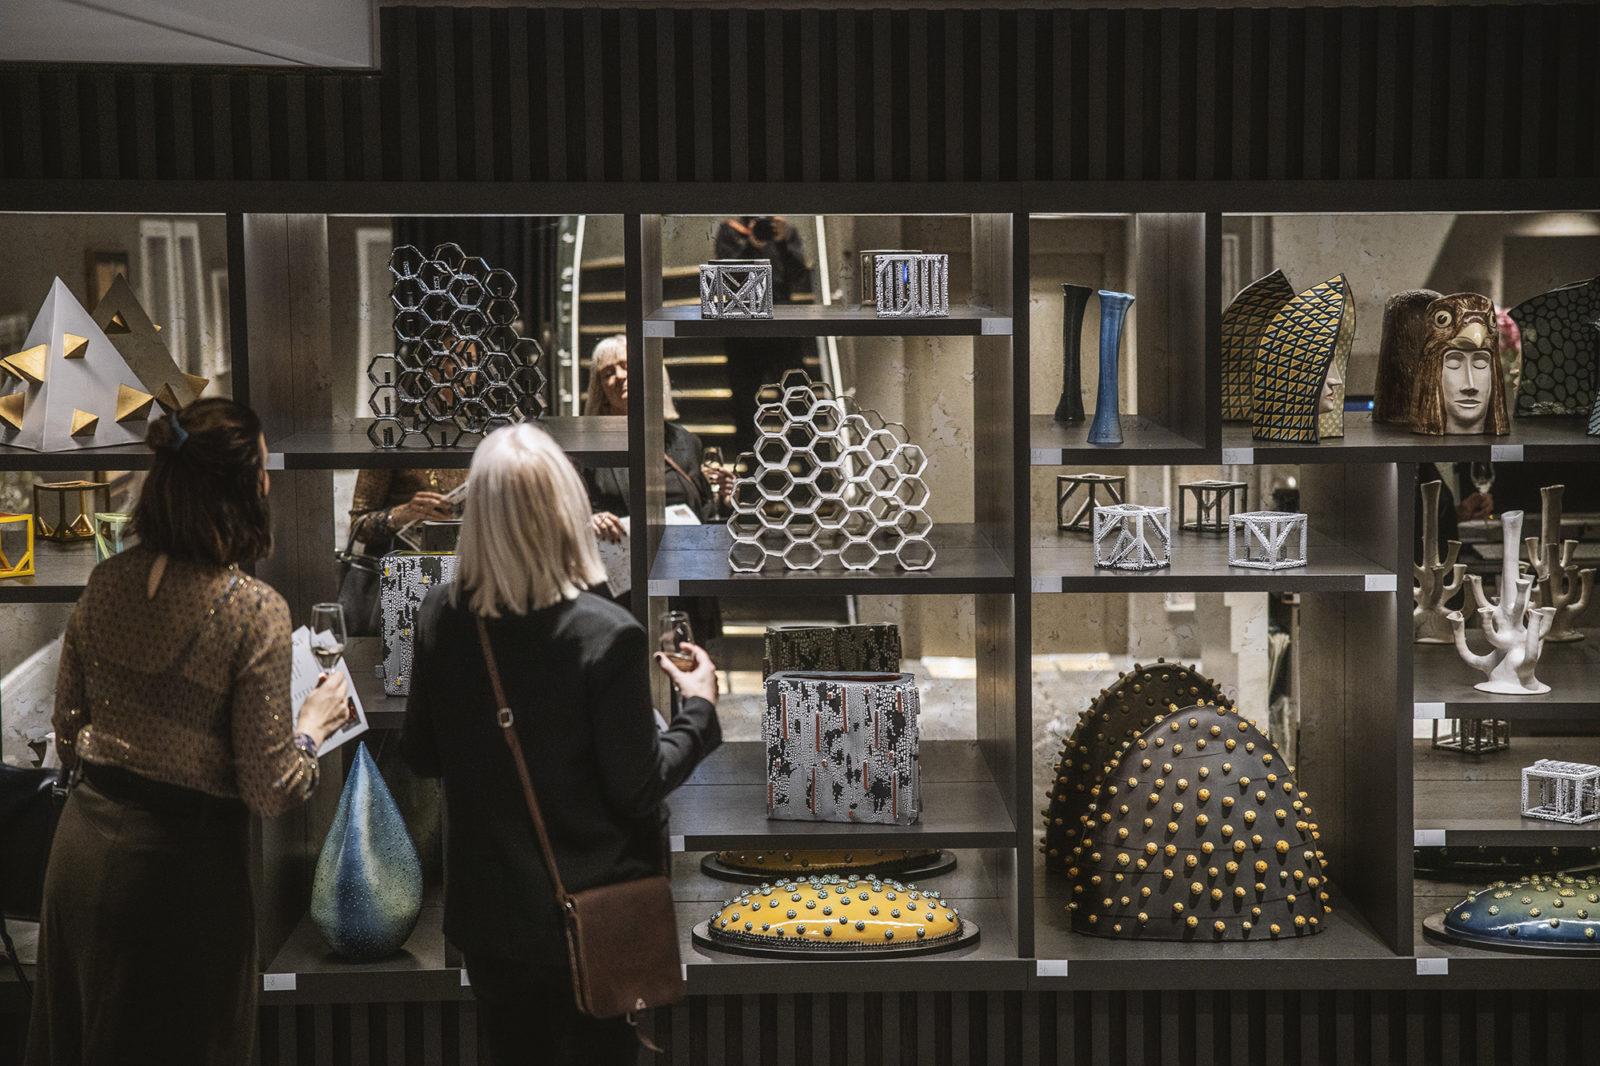 opening of ceramic artists Liv Aursand and Per Lysgaard, exhibiting at Britannia Hotel